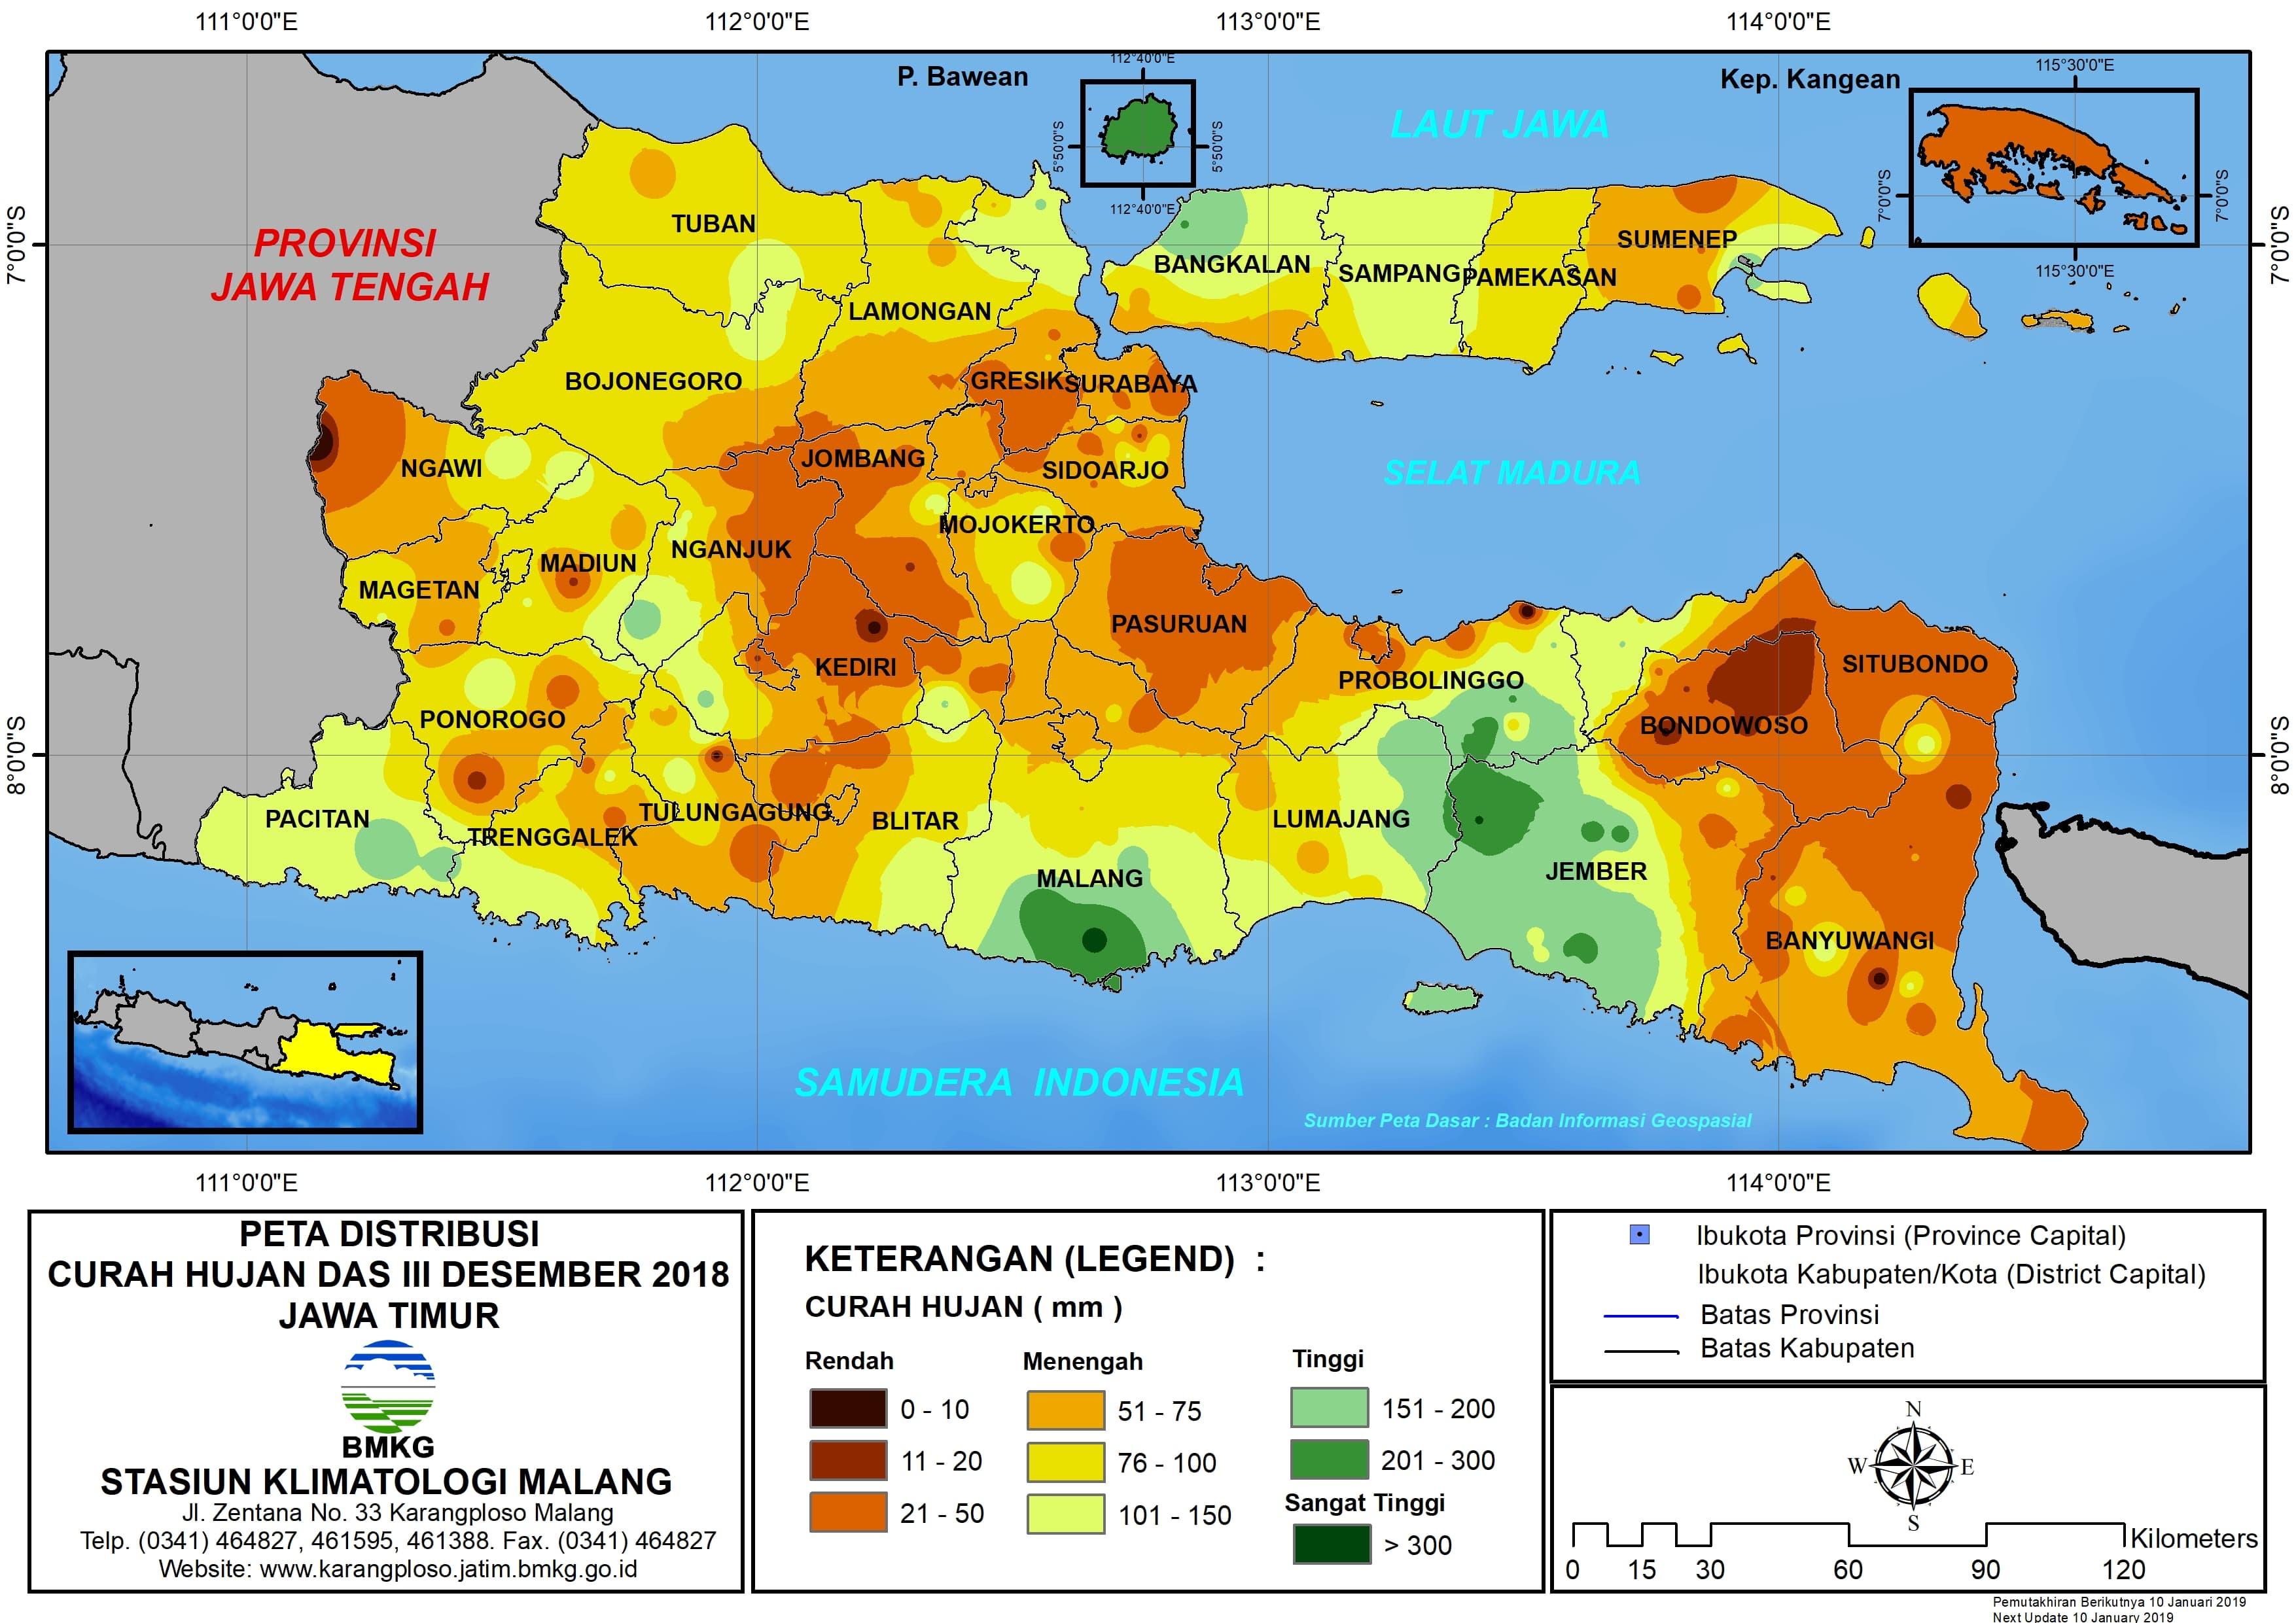 Peta Analisis Distribusi Curah Hujan Dasarian III Desember 2018 di Provinsi Jawa Timur